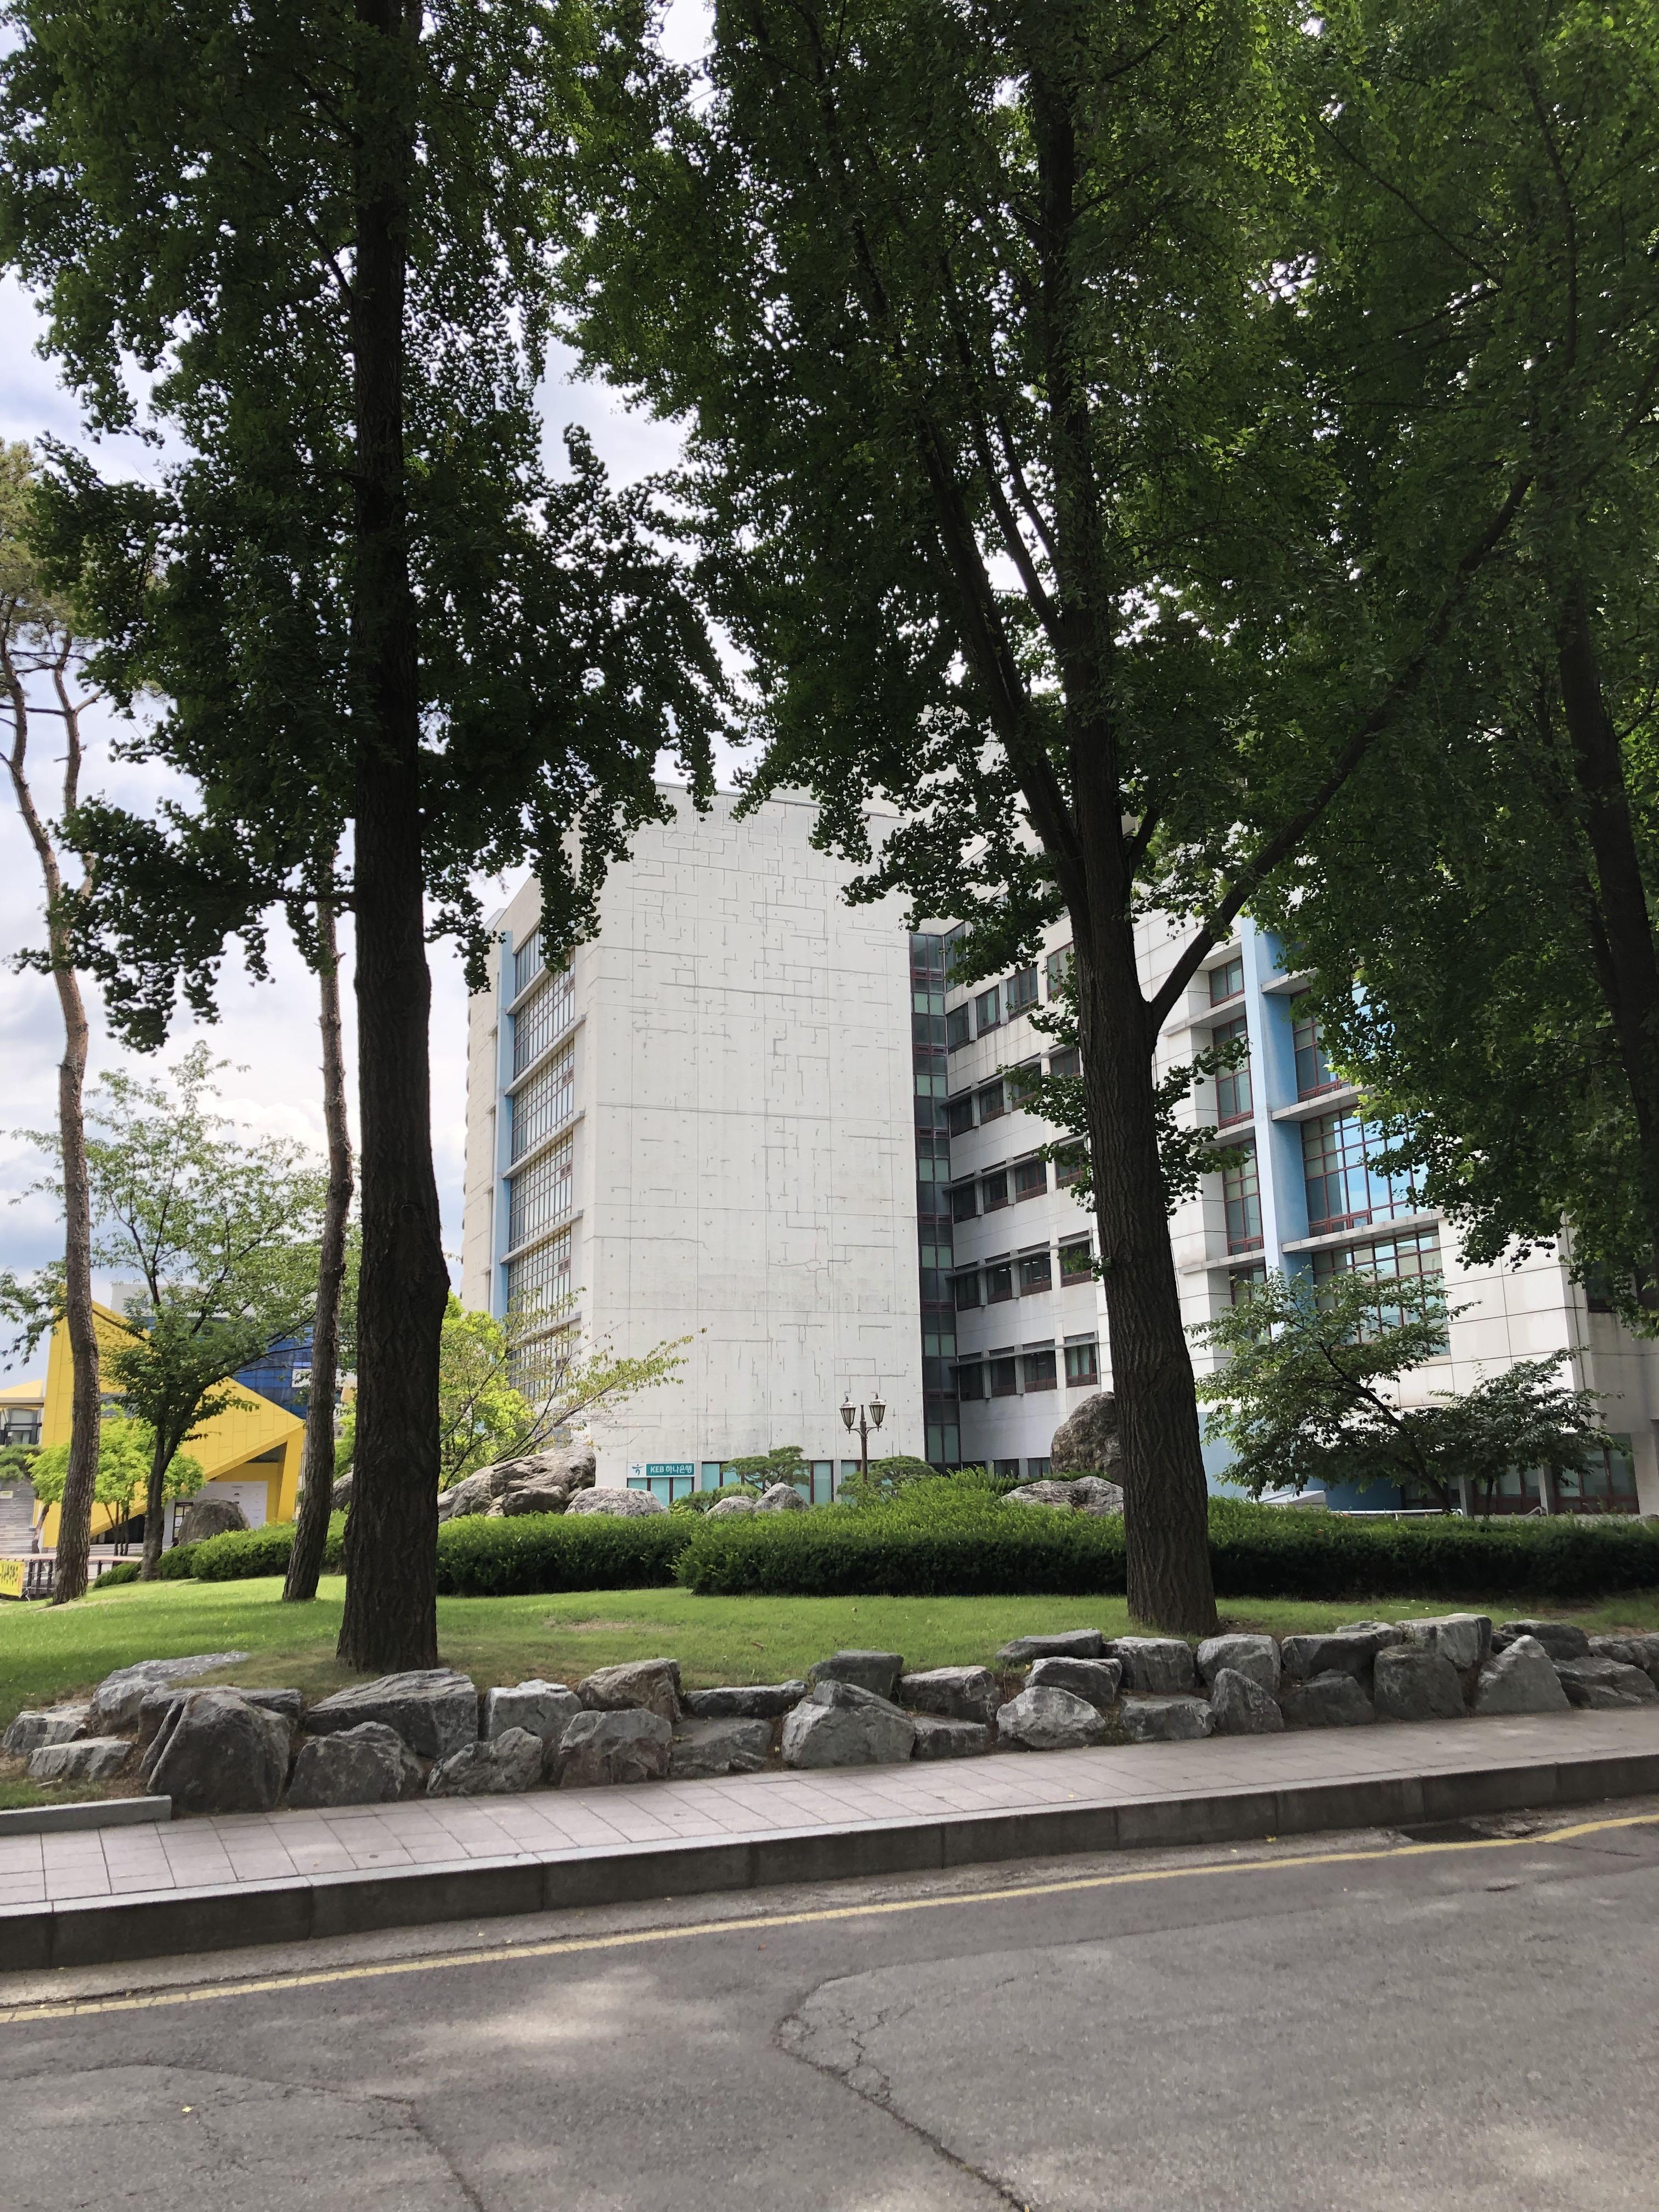 Kyung Hee University - campus photo 6